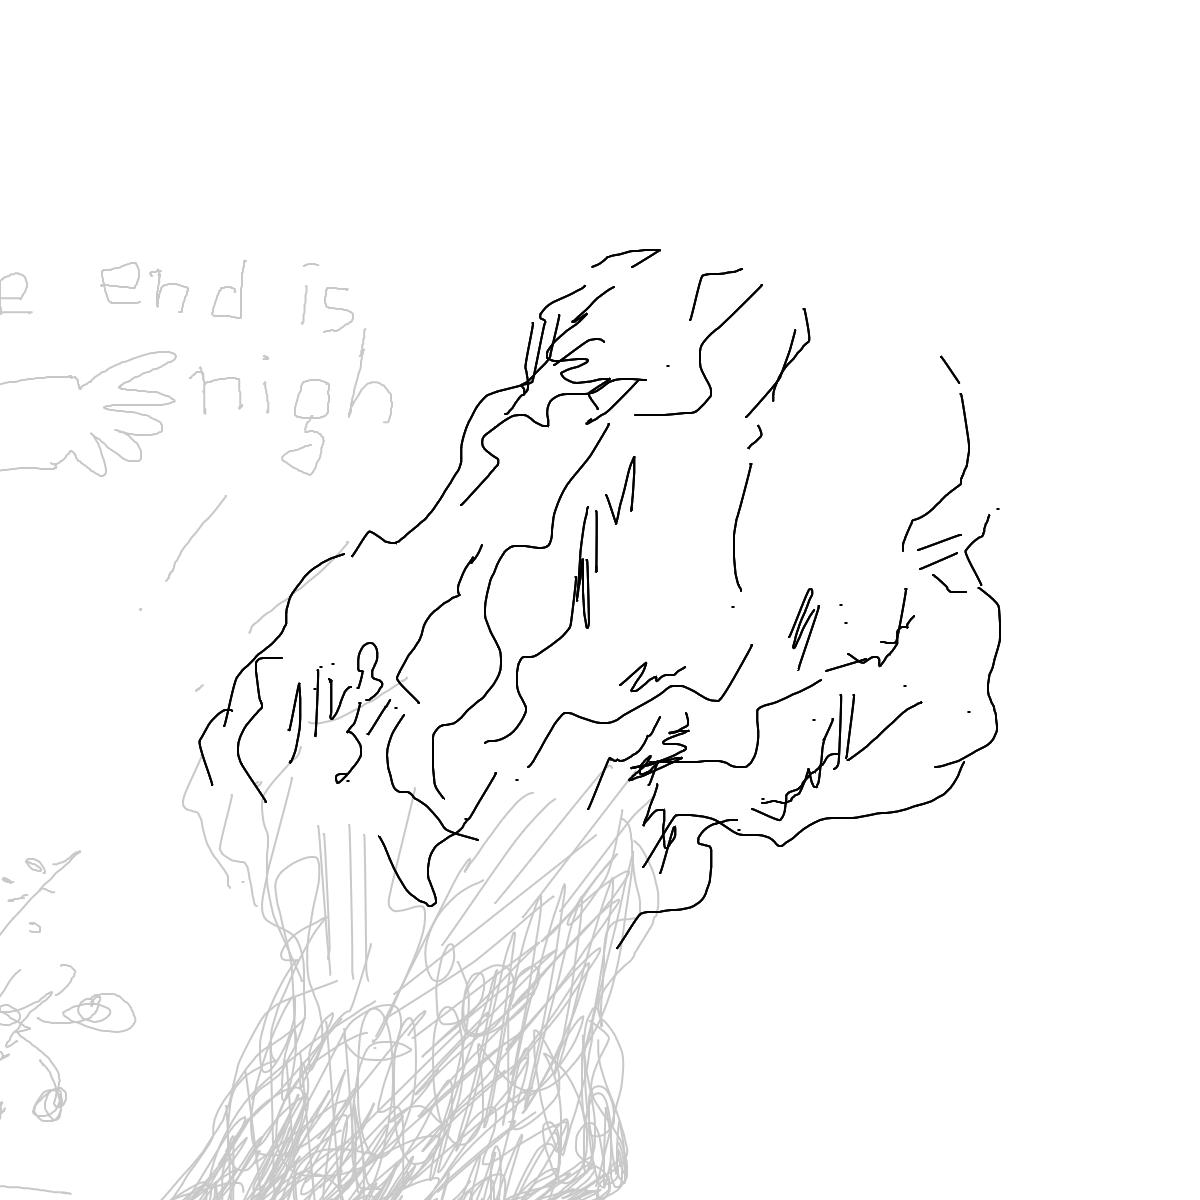 BAAAM drawing#6016 lat:51.5068283081054700lng: -0.1636236906051636